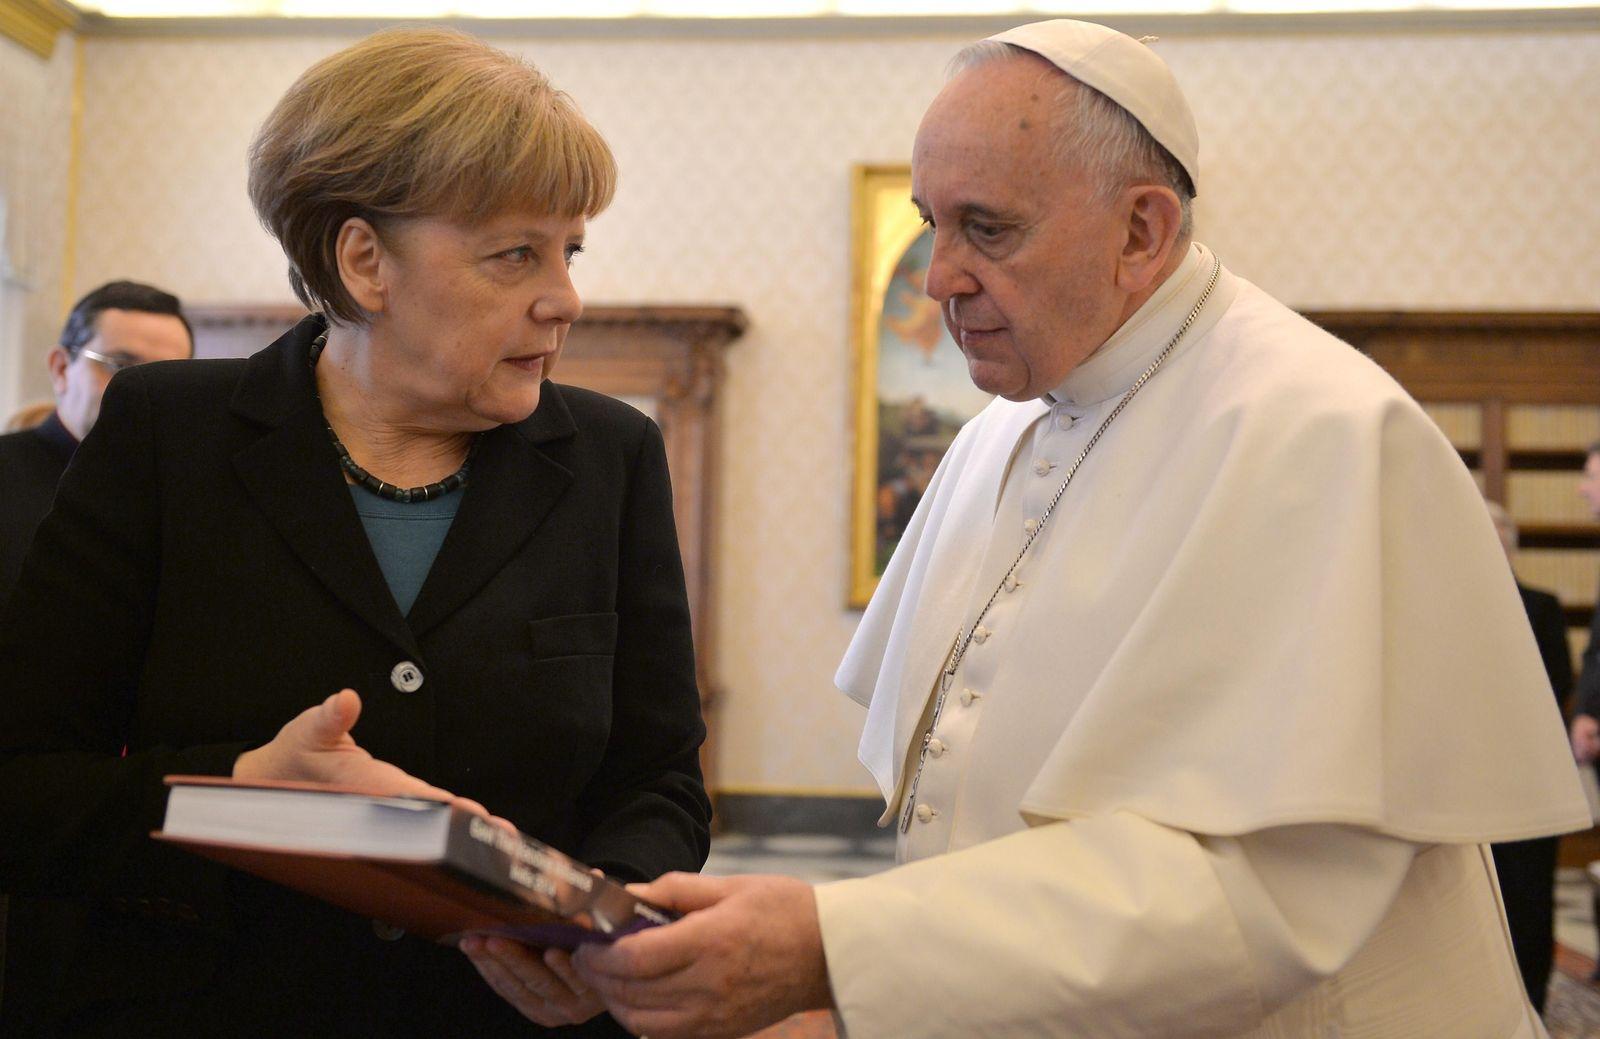 Merkel/ Papst/ Vatican Pope